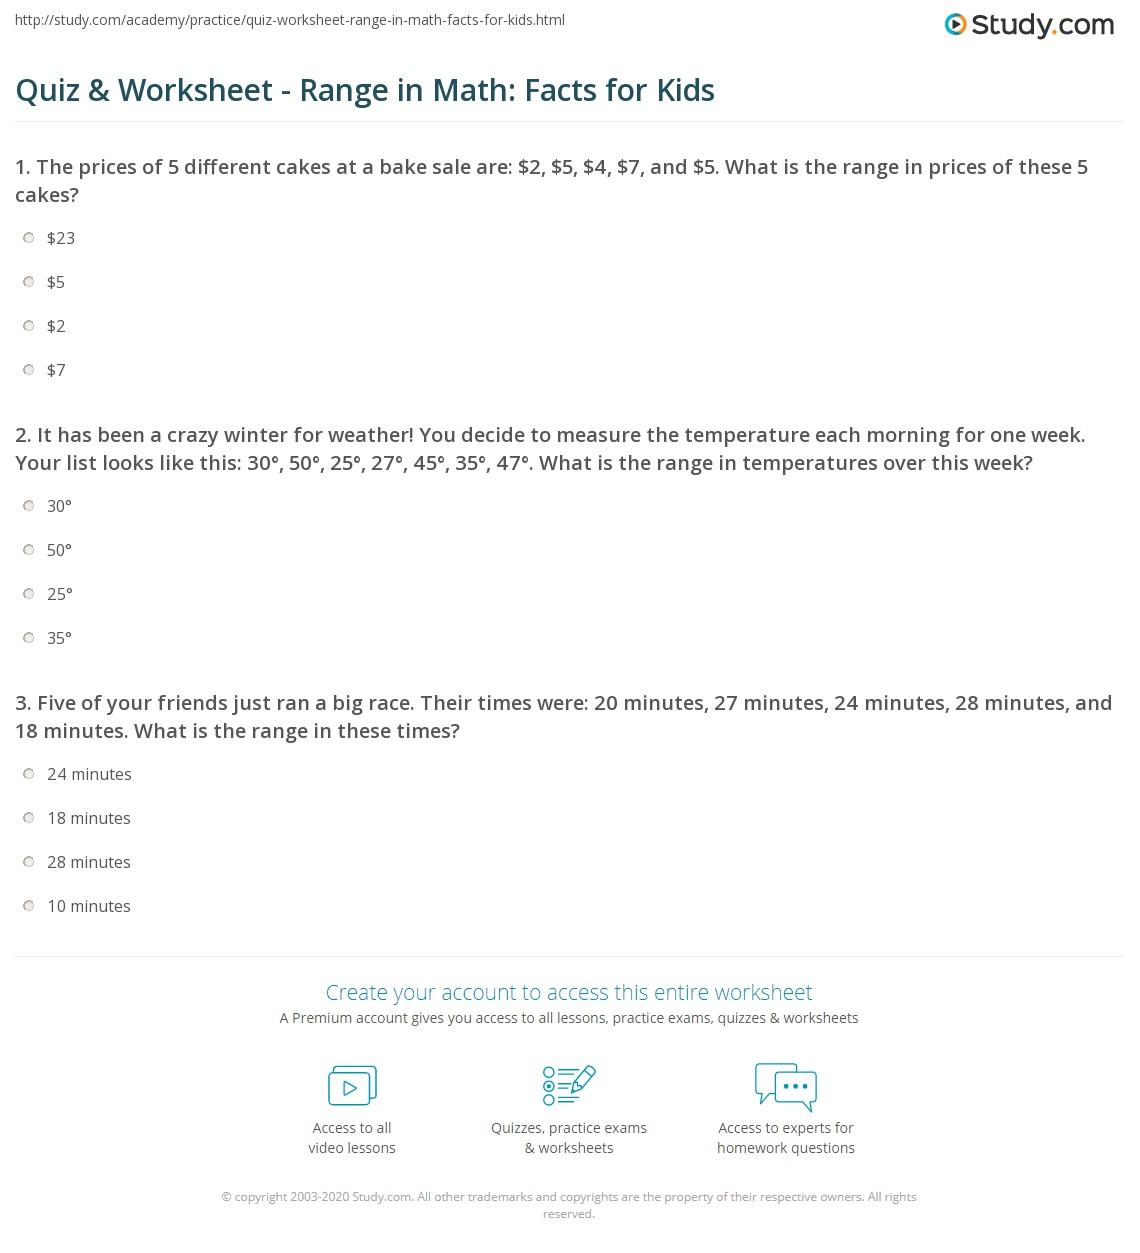 Quiz & Worksheet - Range in Math: Facts for Kids | Study.com